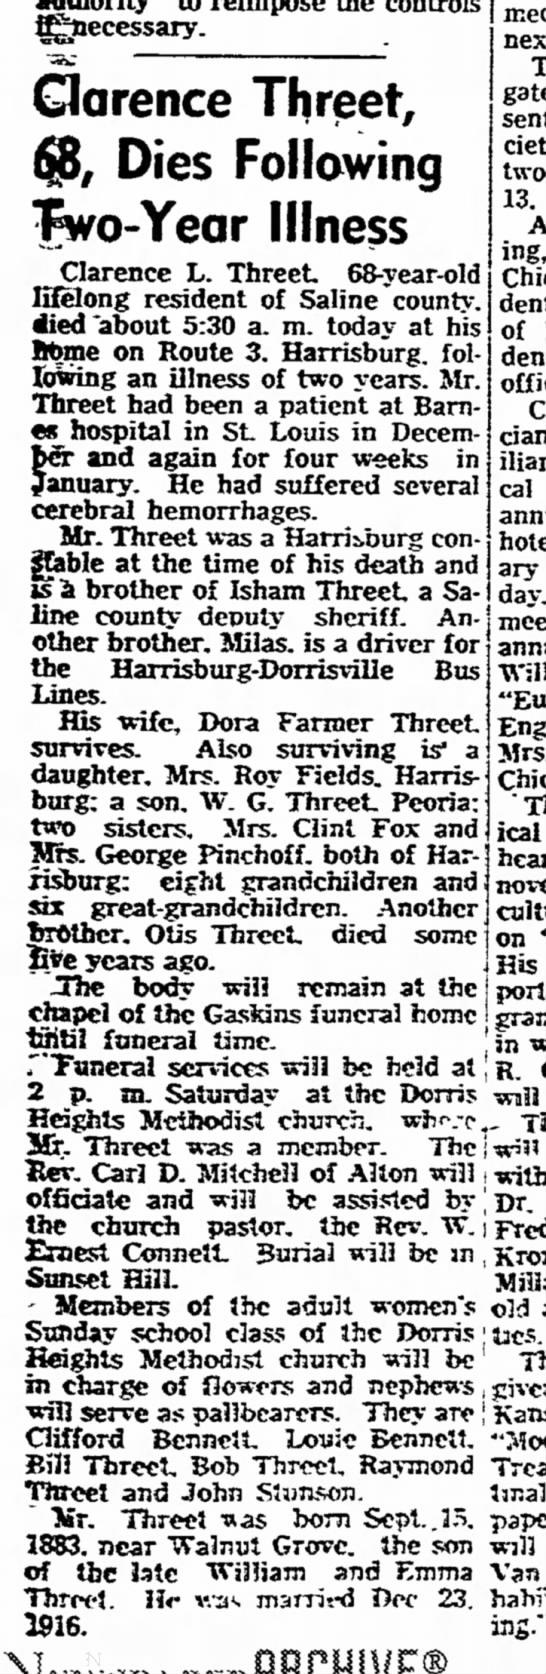 Clarence Threet - fljttecessary. Clarence Threet, $B, Dies...